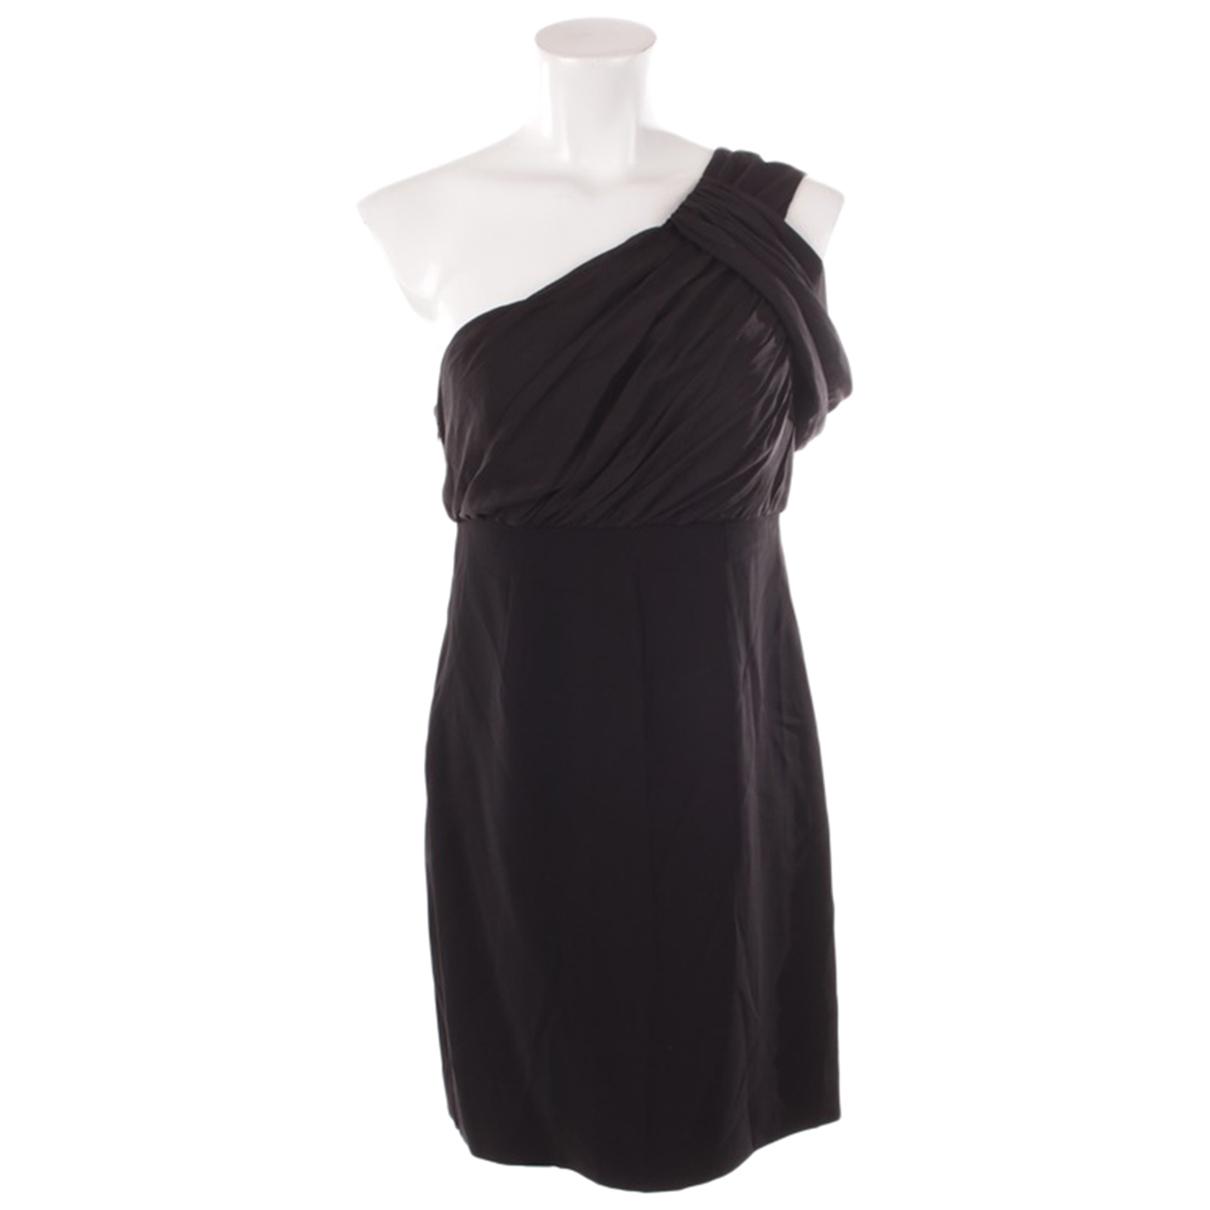 Rachel Zoe \N Kleid in  Schwarz Baumwolle